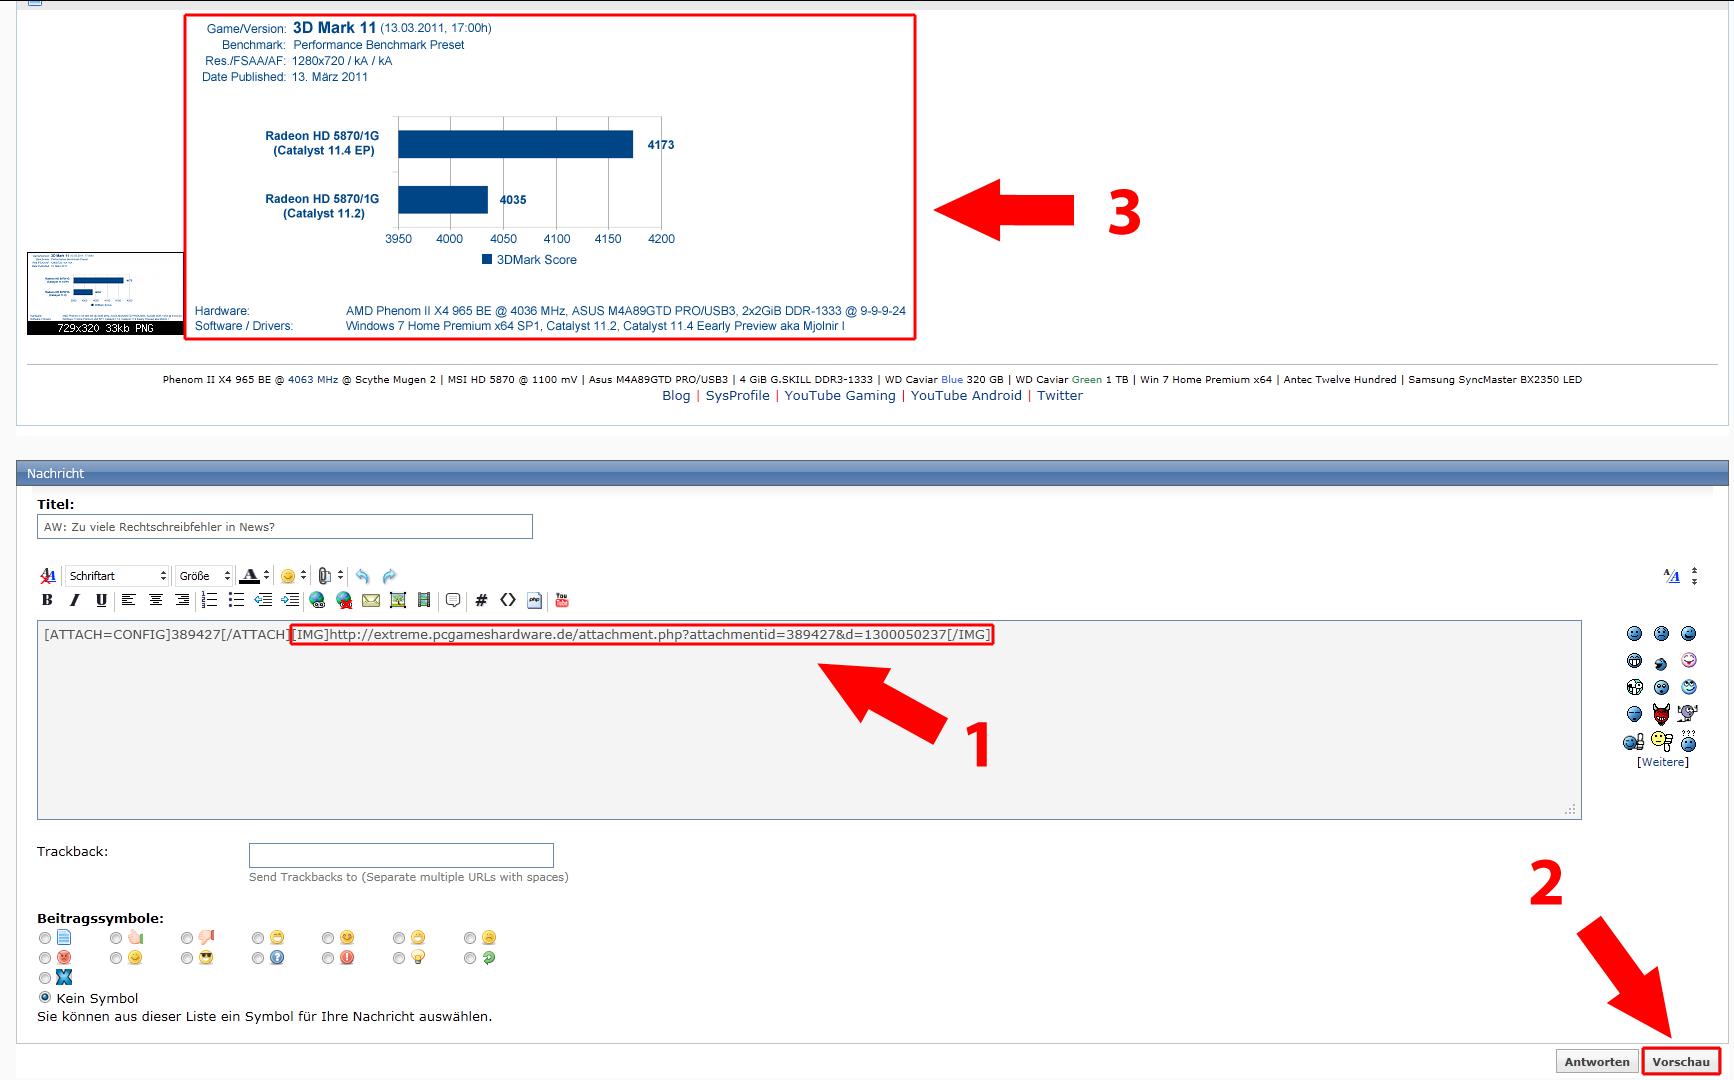 [How To] Bilderupload im Forum - Version 2.1-10.png